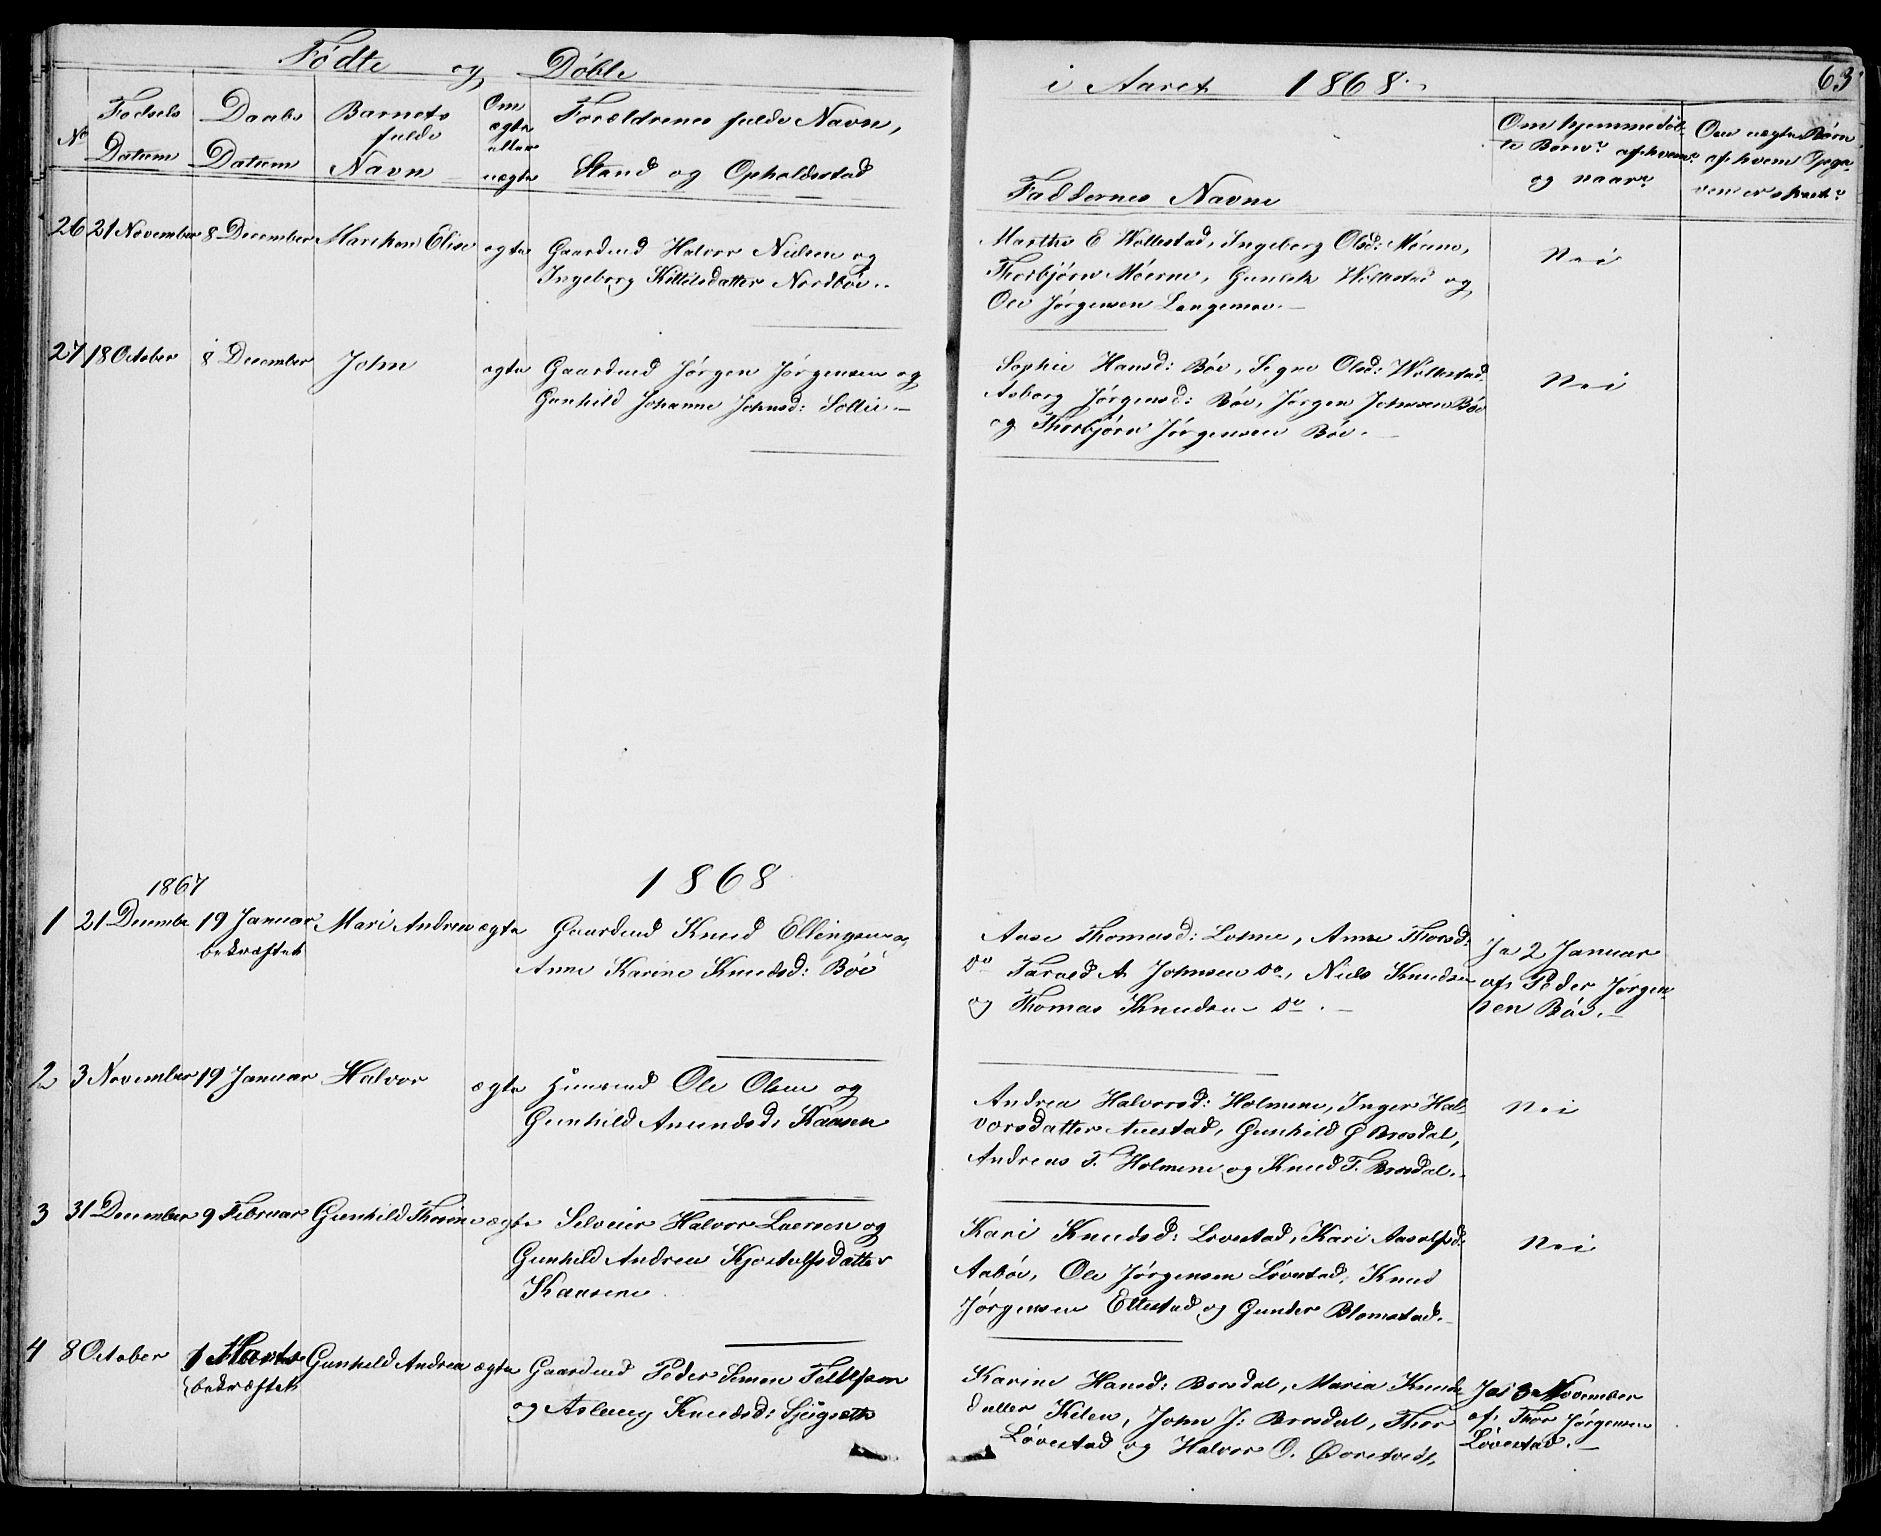 SAKO, Drangedal kirkebøker, G/Gb/L0001: Klokkerbok nr. II 1, 1856-1894, s. 63